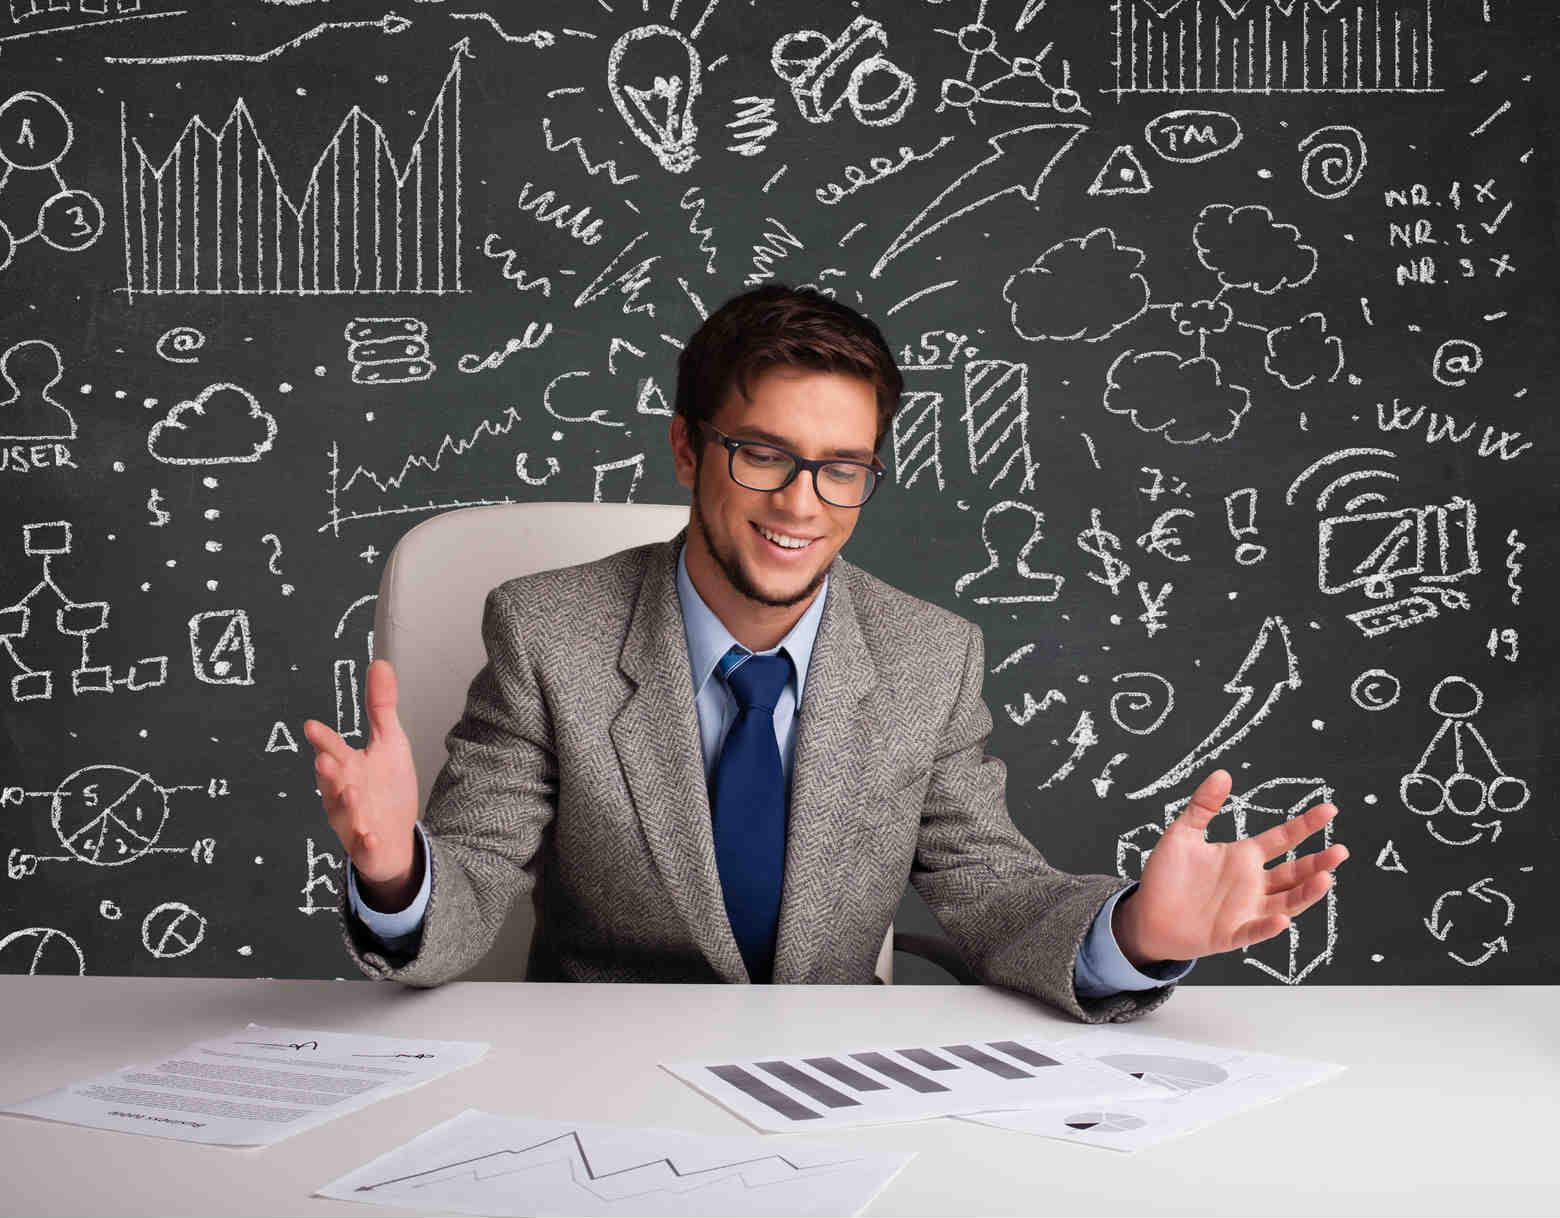 Где и как взять кредит на бизнес